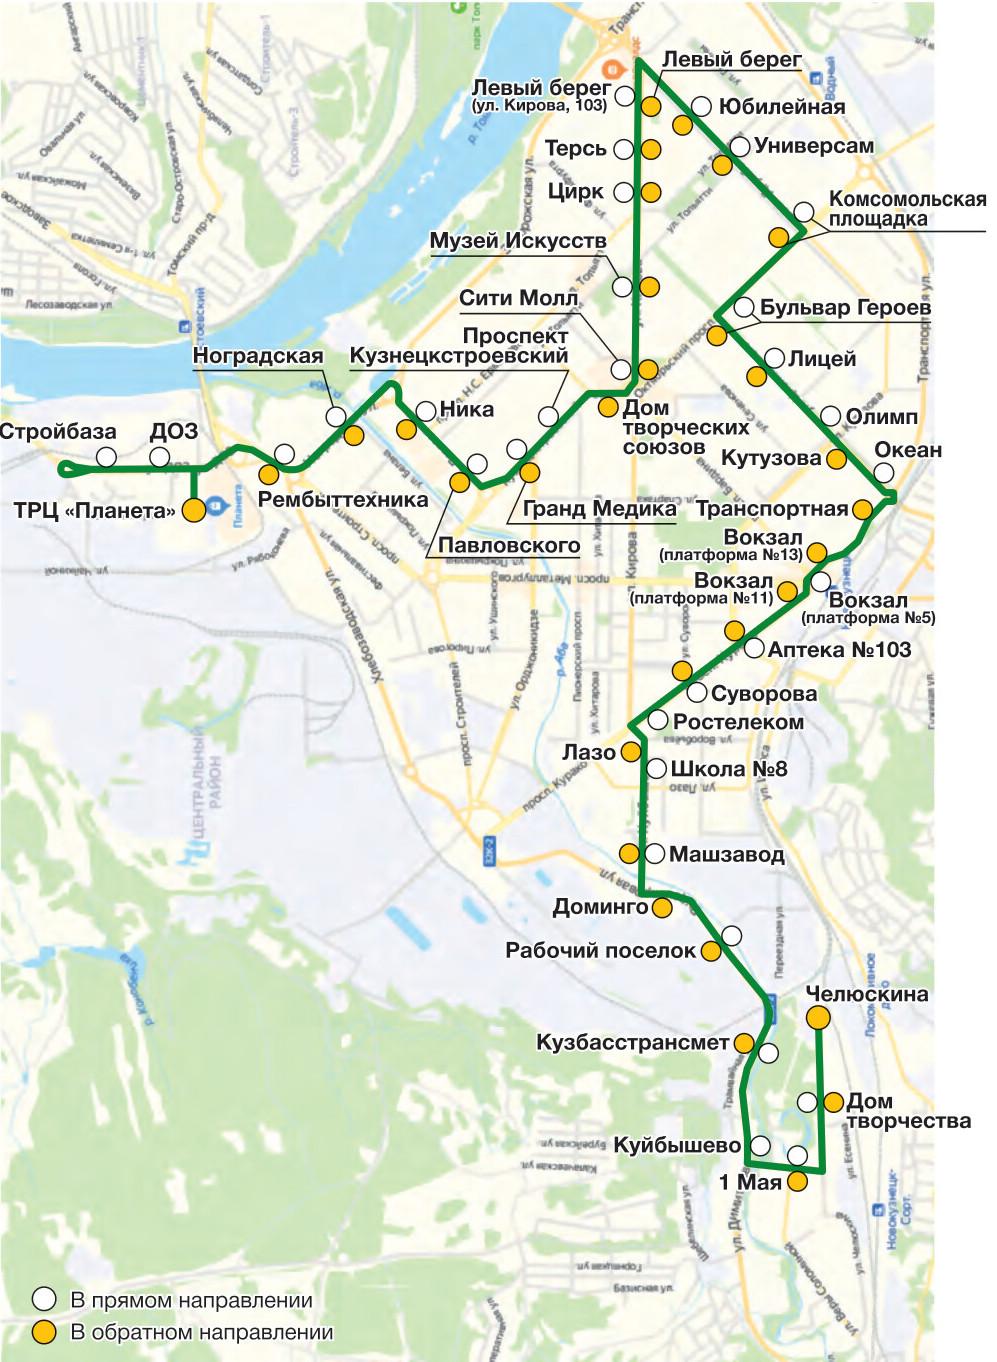 Автобус №27 НОВОБАЙДАЕВКА - ЧЕЛЮСКИНА | Карта маршрута